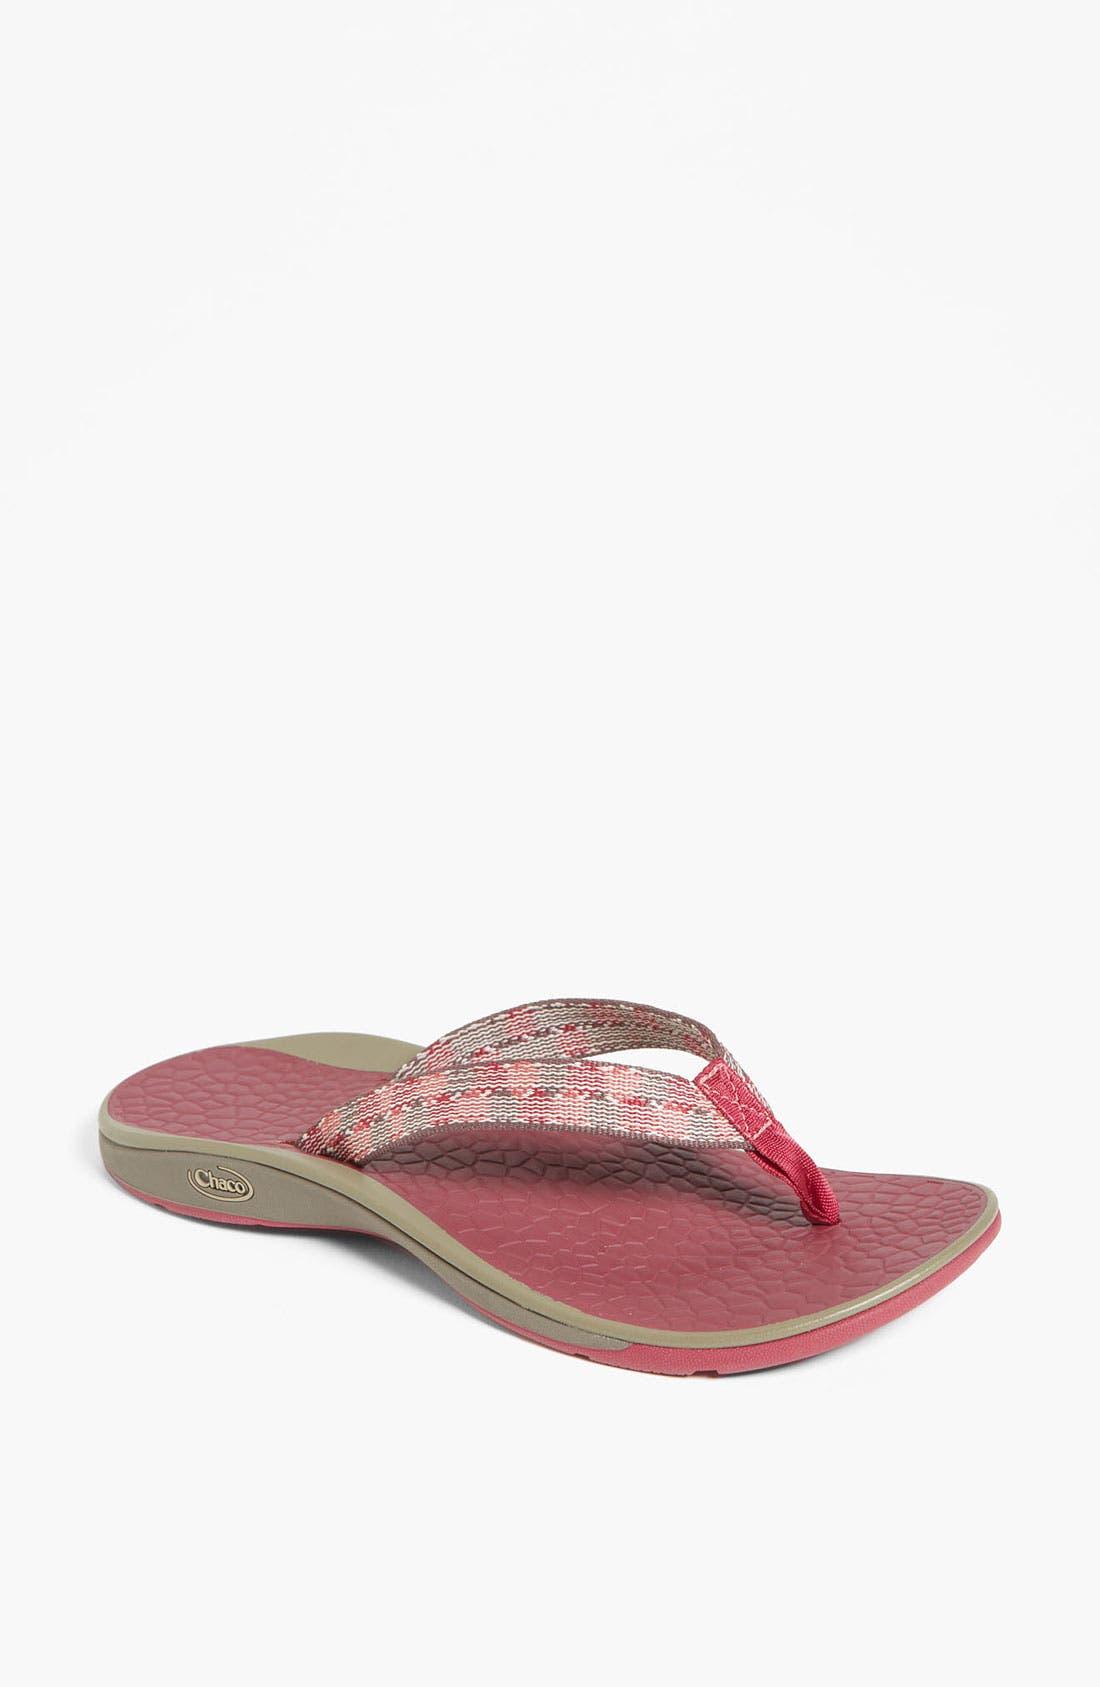 Main Image - Chaco 'Fathom' Sandal